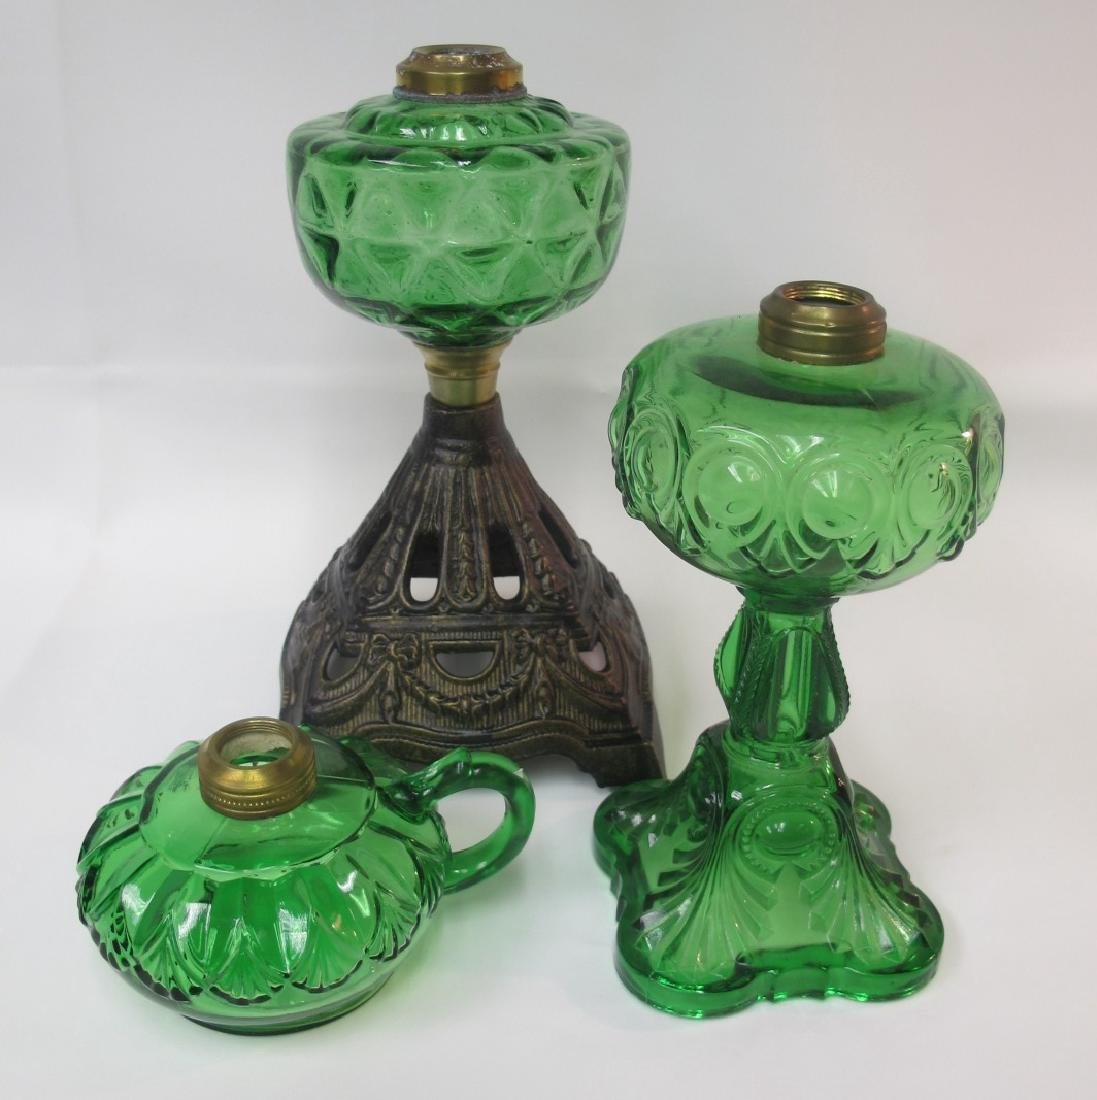 Collection of Three (3) Antique Emerald Green Kerosene